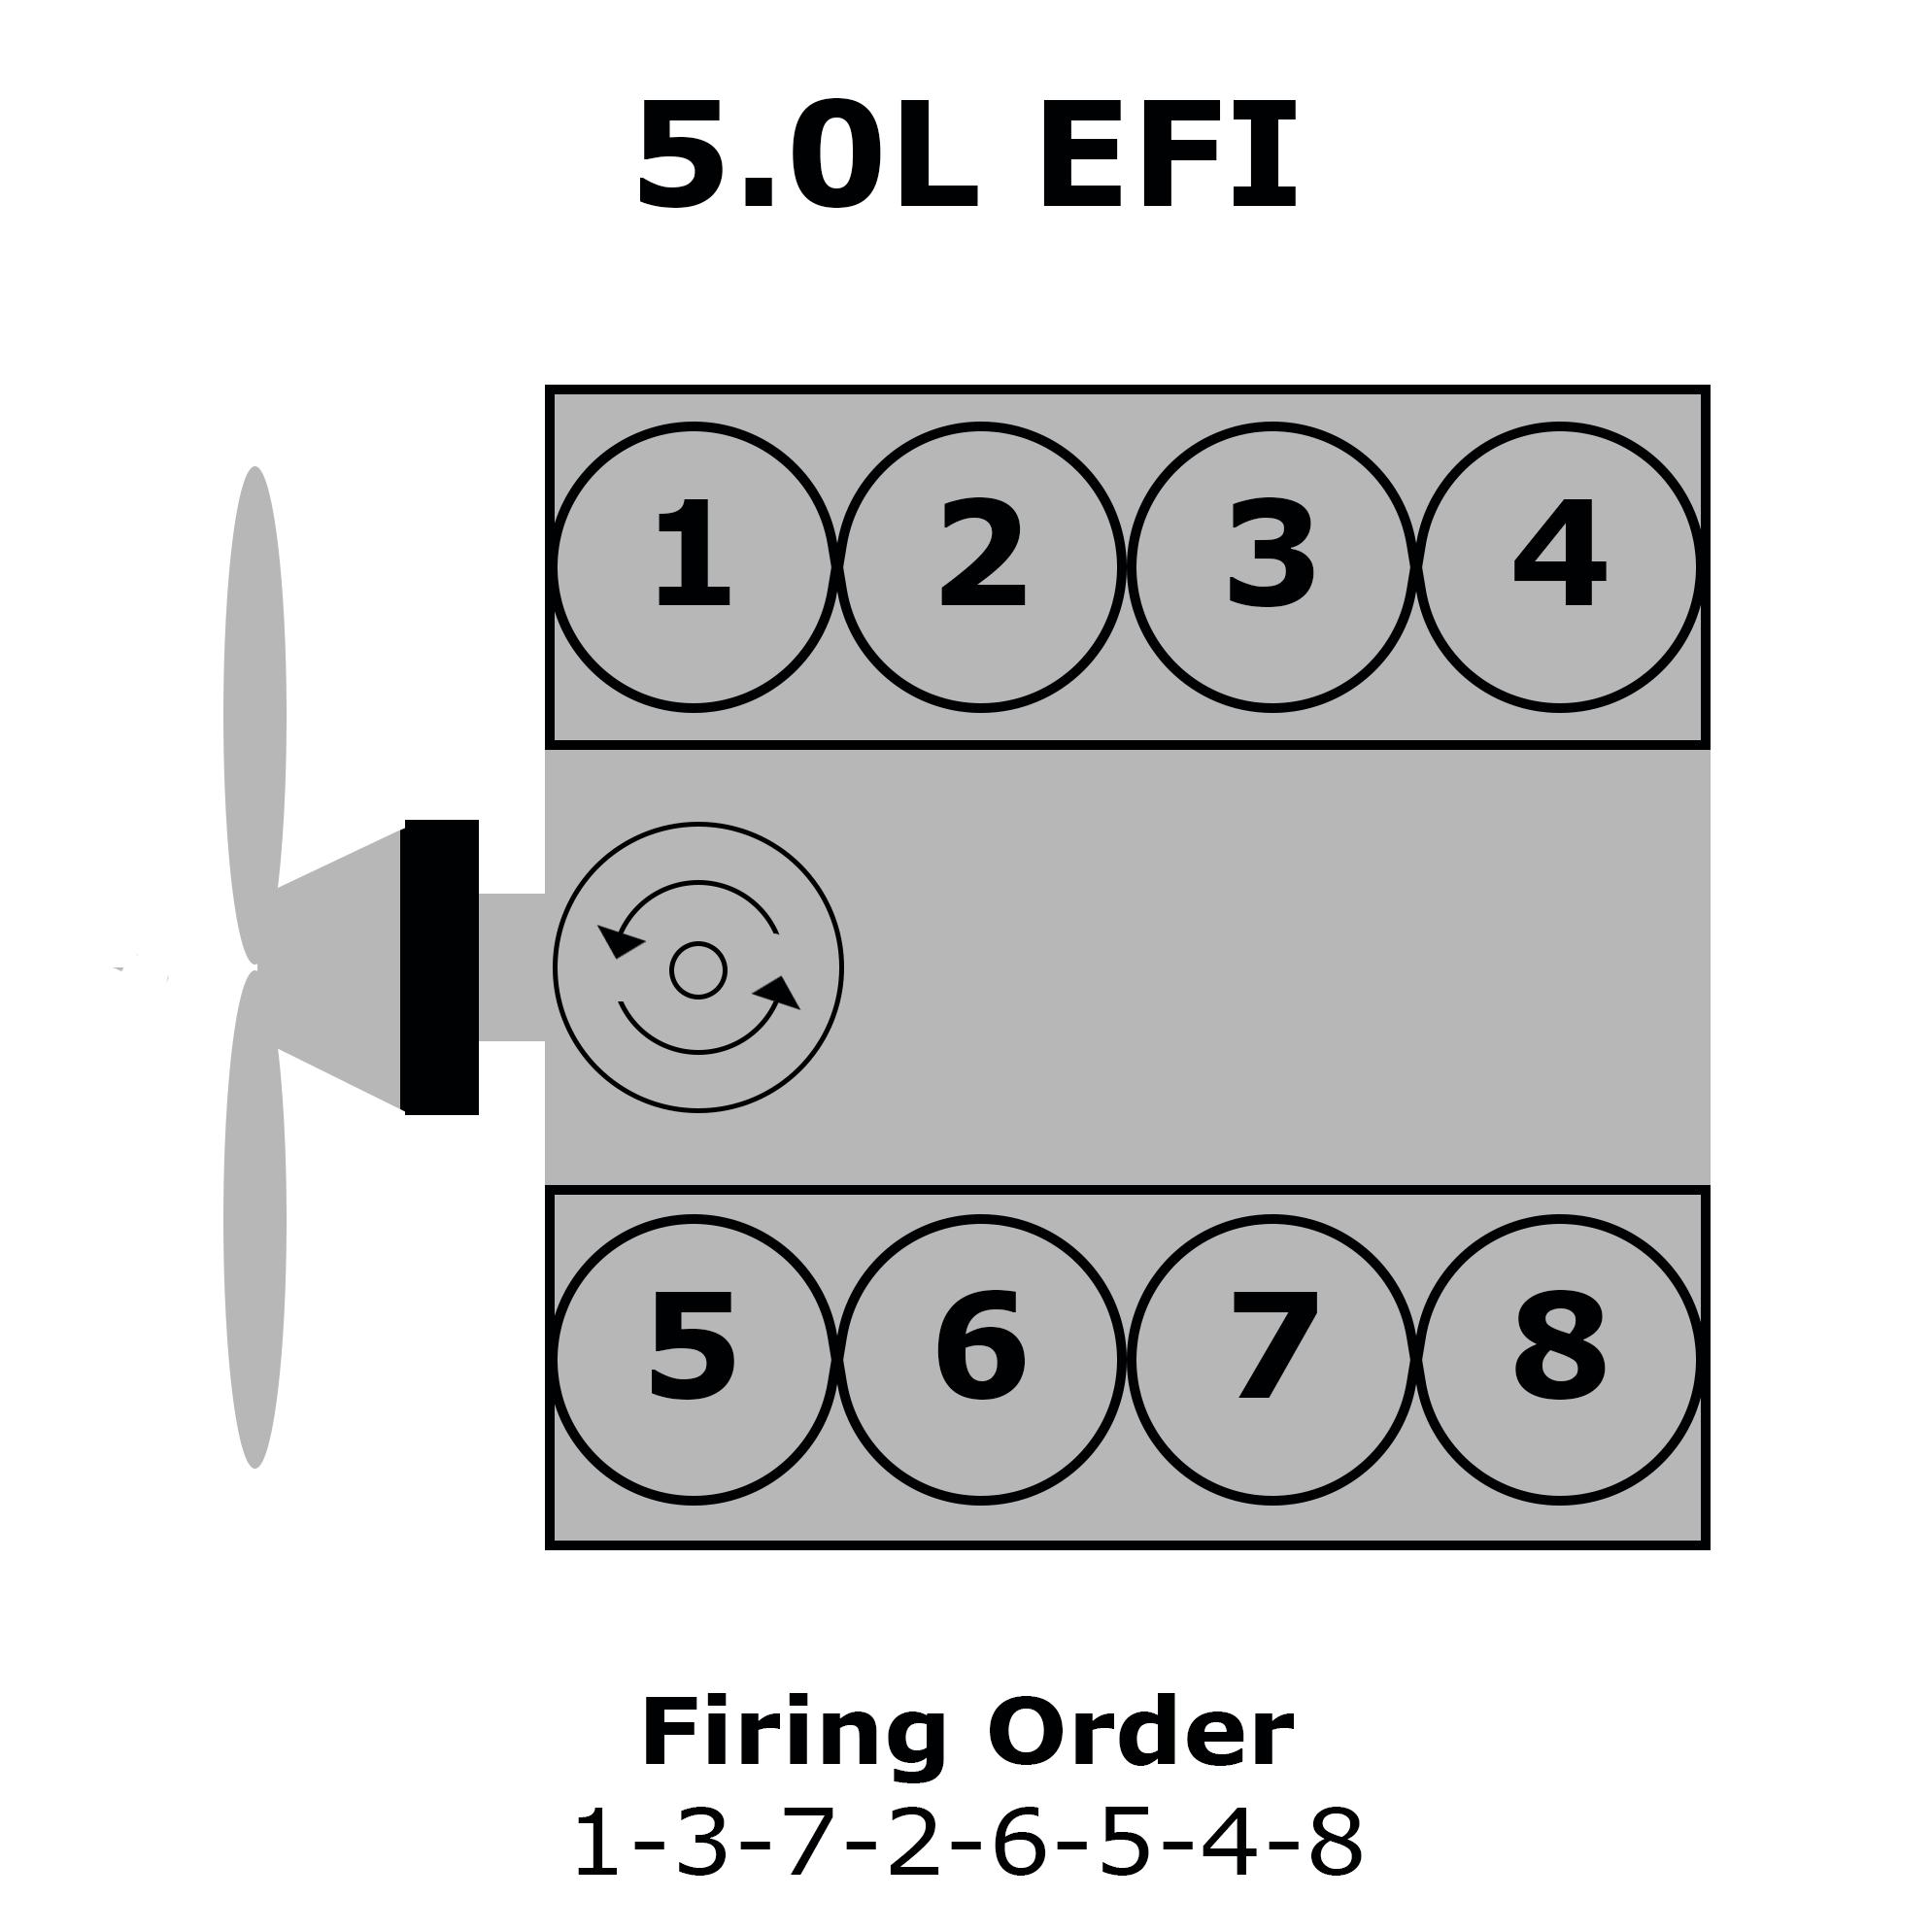 Ford 5.0L Efi Firing Order